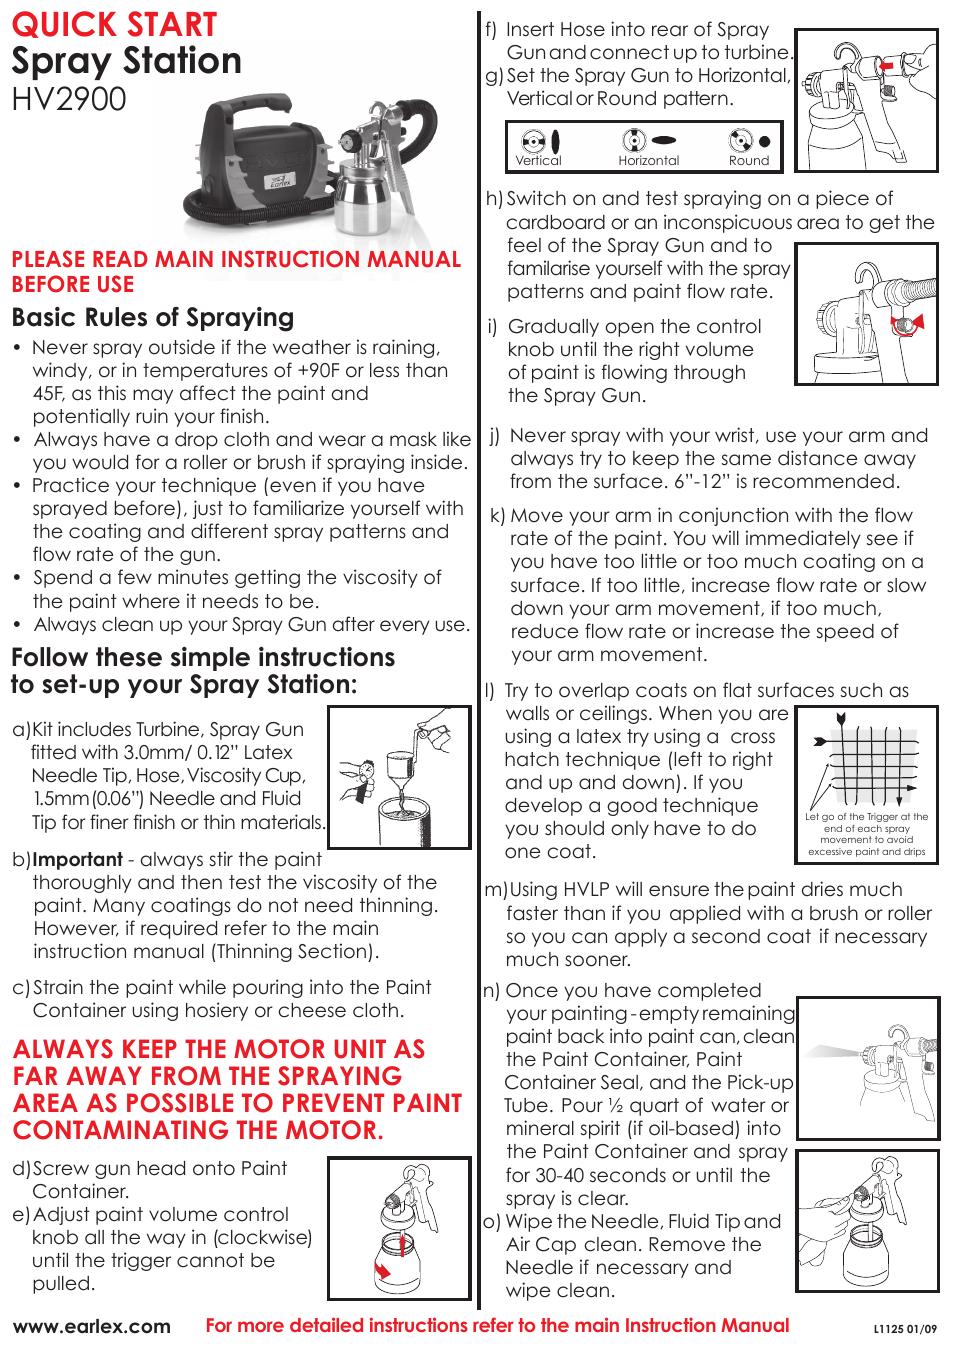 Earlex SPRAY STAT??ON HV2900 User Manual | 1 page